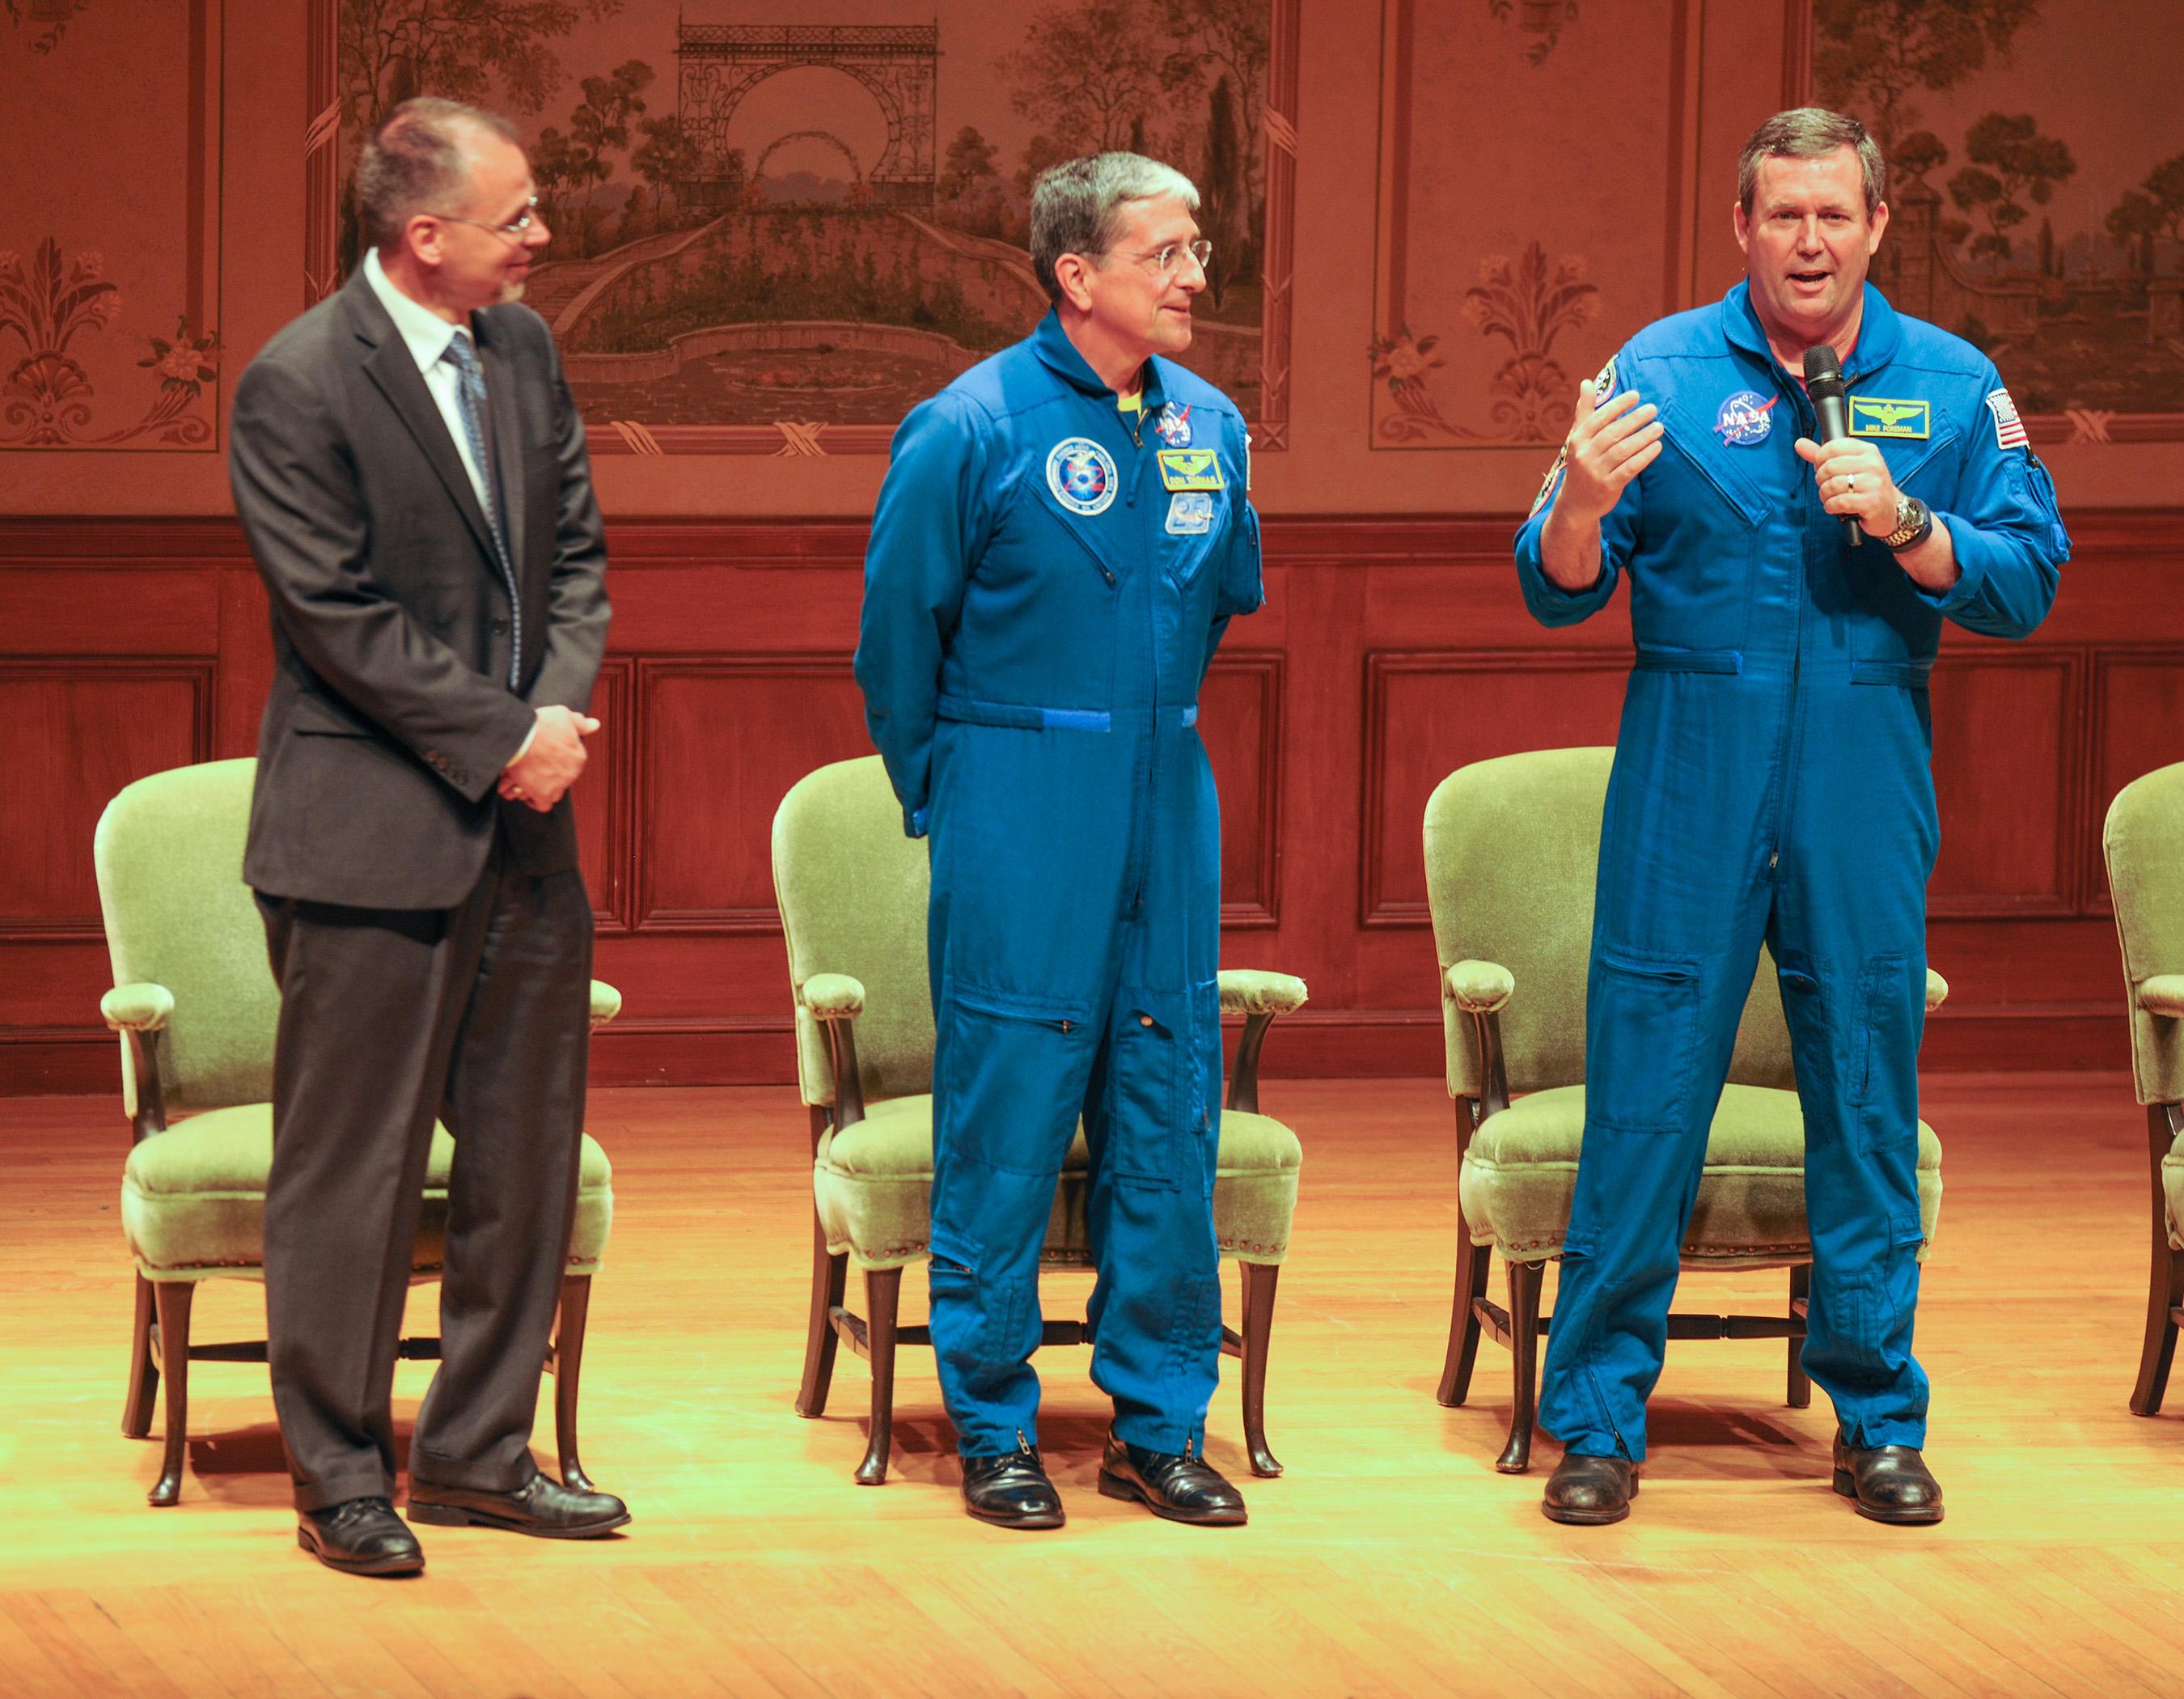 michael foreman astronaut - photo #19